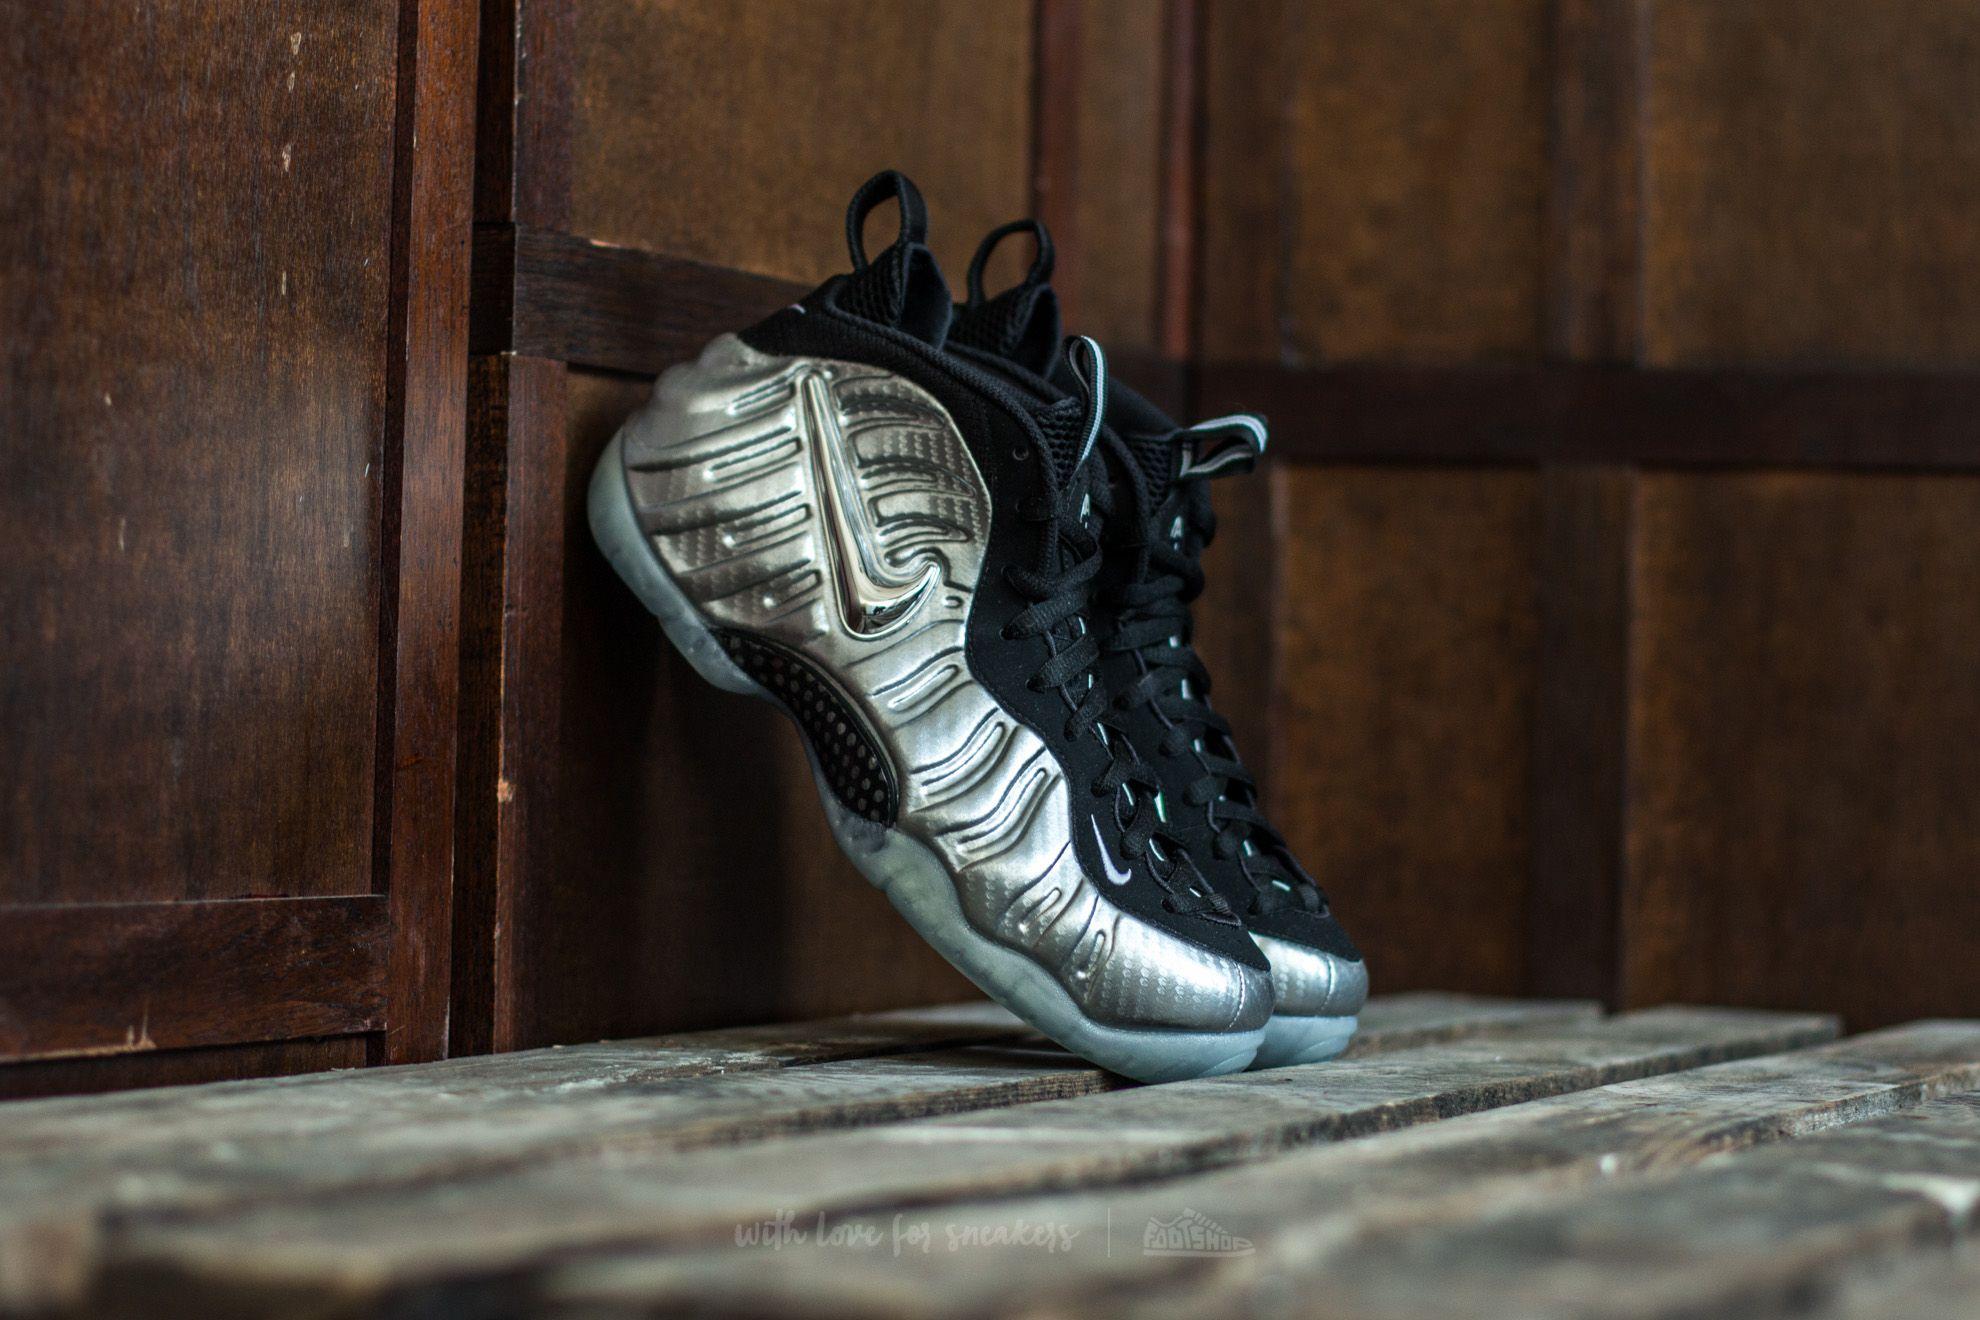 Nike Air Foamposite Pro Metallic Silver  d2b0bff4ba